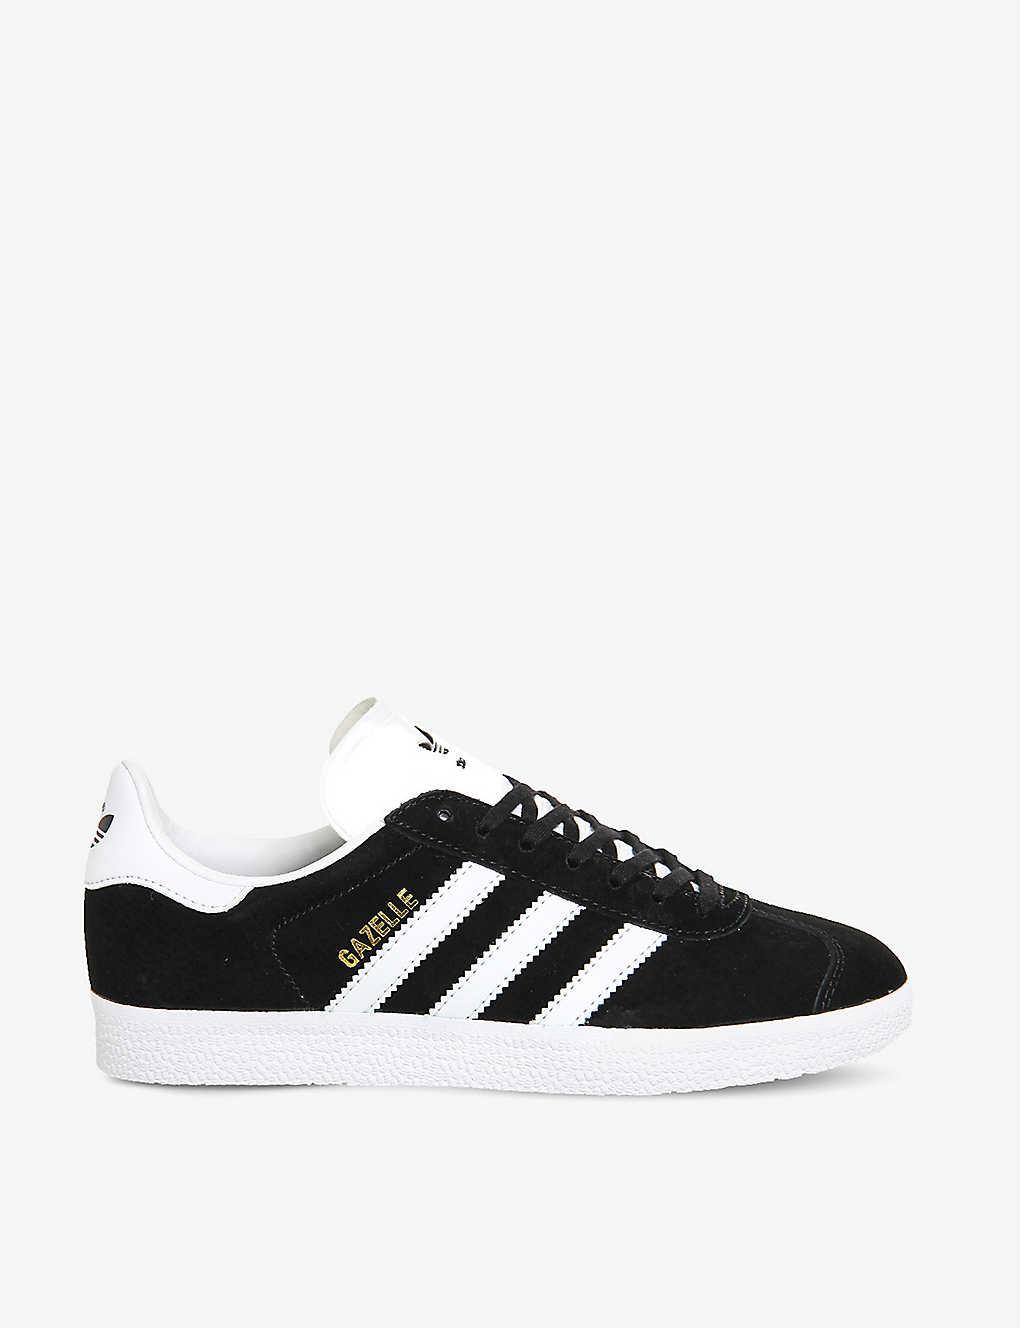 ADIDAS - Gazelle suede sneakers  8057a8393